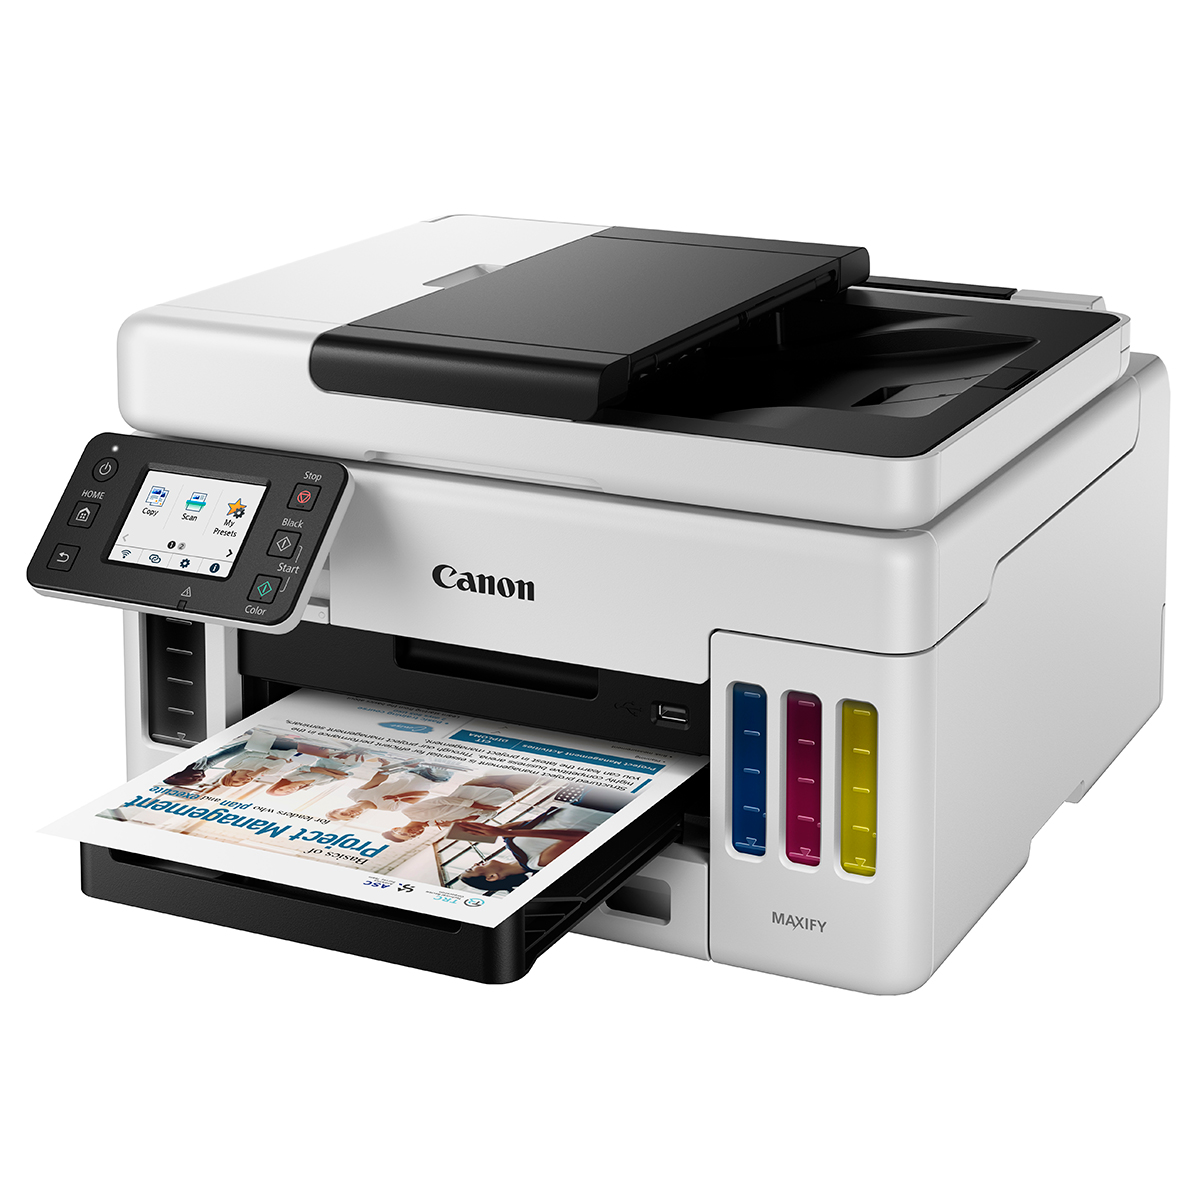 Canon Maxify GX6050 A4 Inkjet Multifunction